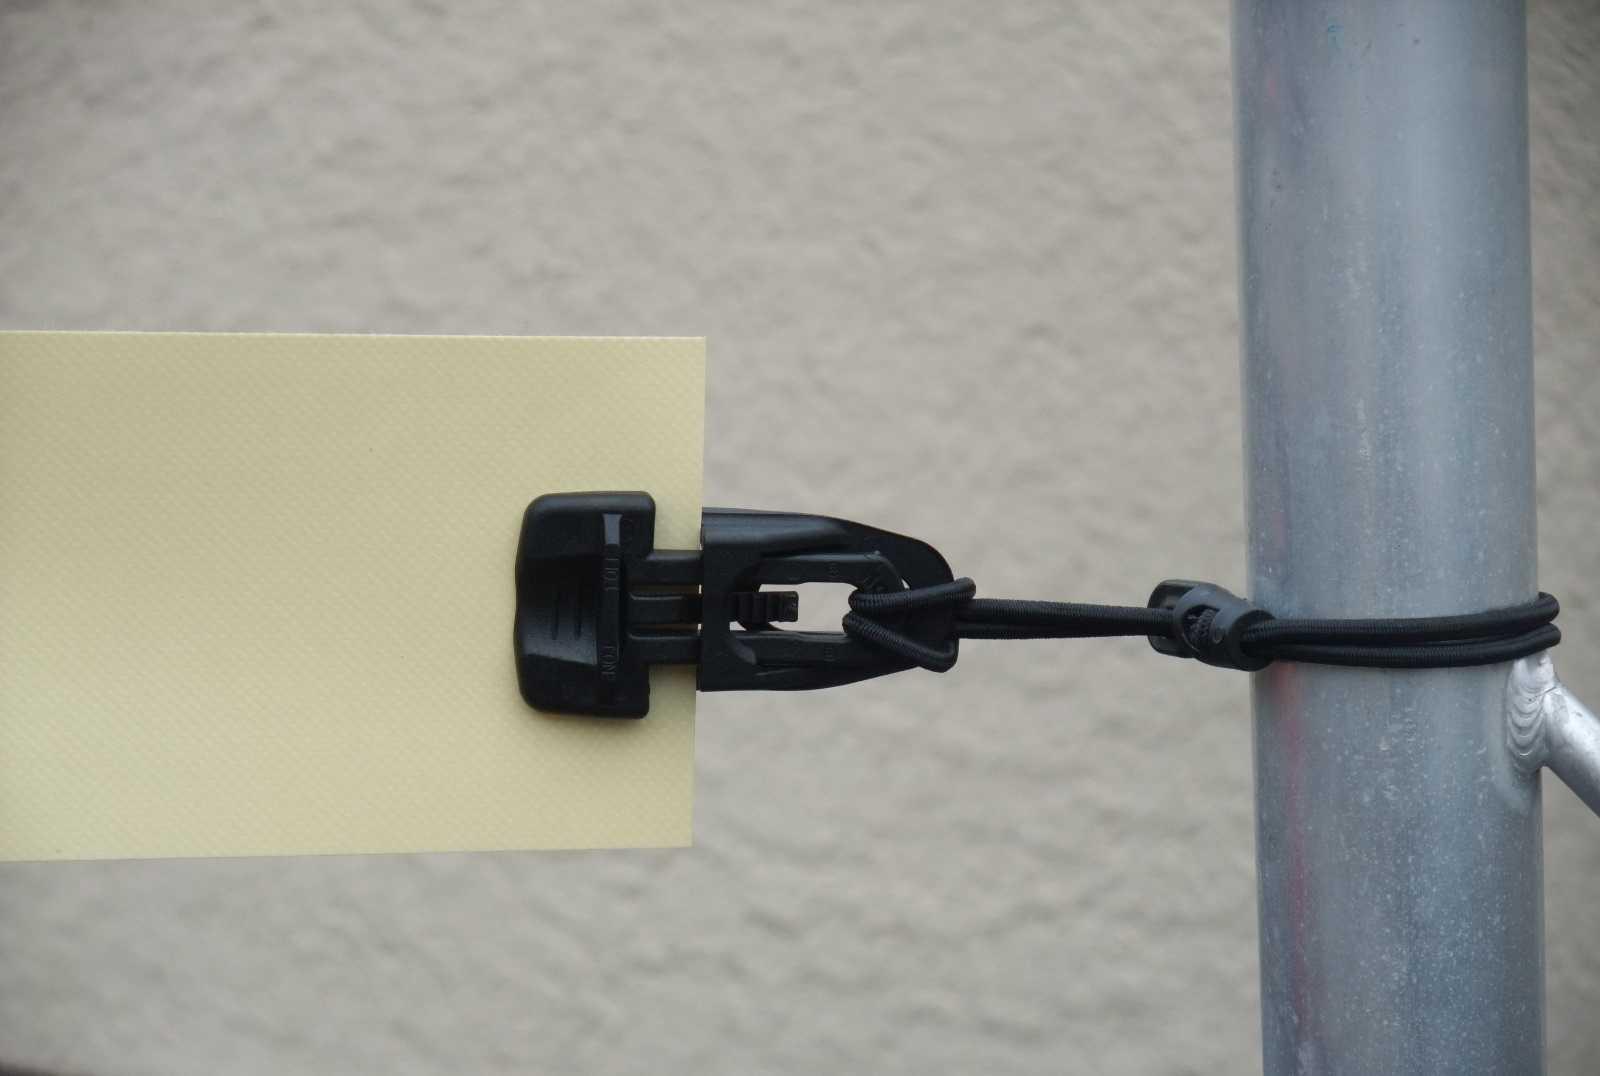 40 x MINI-Clip Ösen-Planen-Spanner schwarz Ösen-Spannfix-Spannfixe Spannklammer